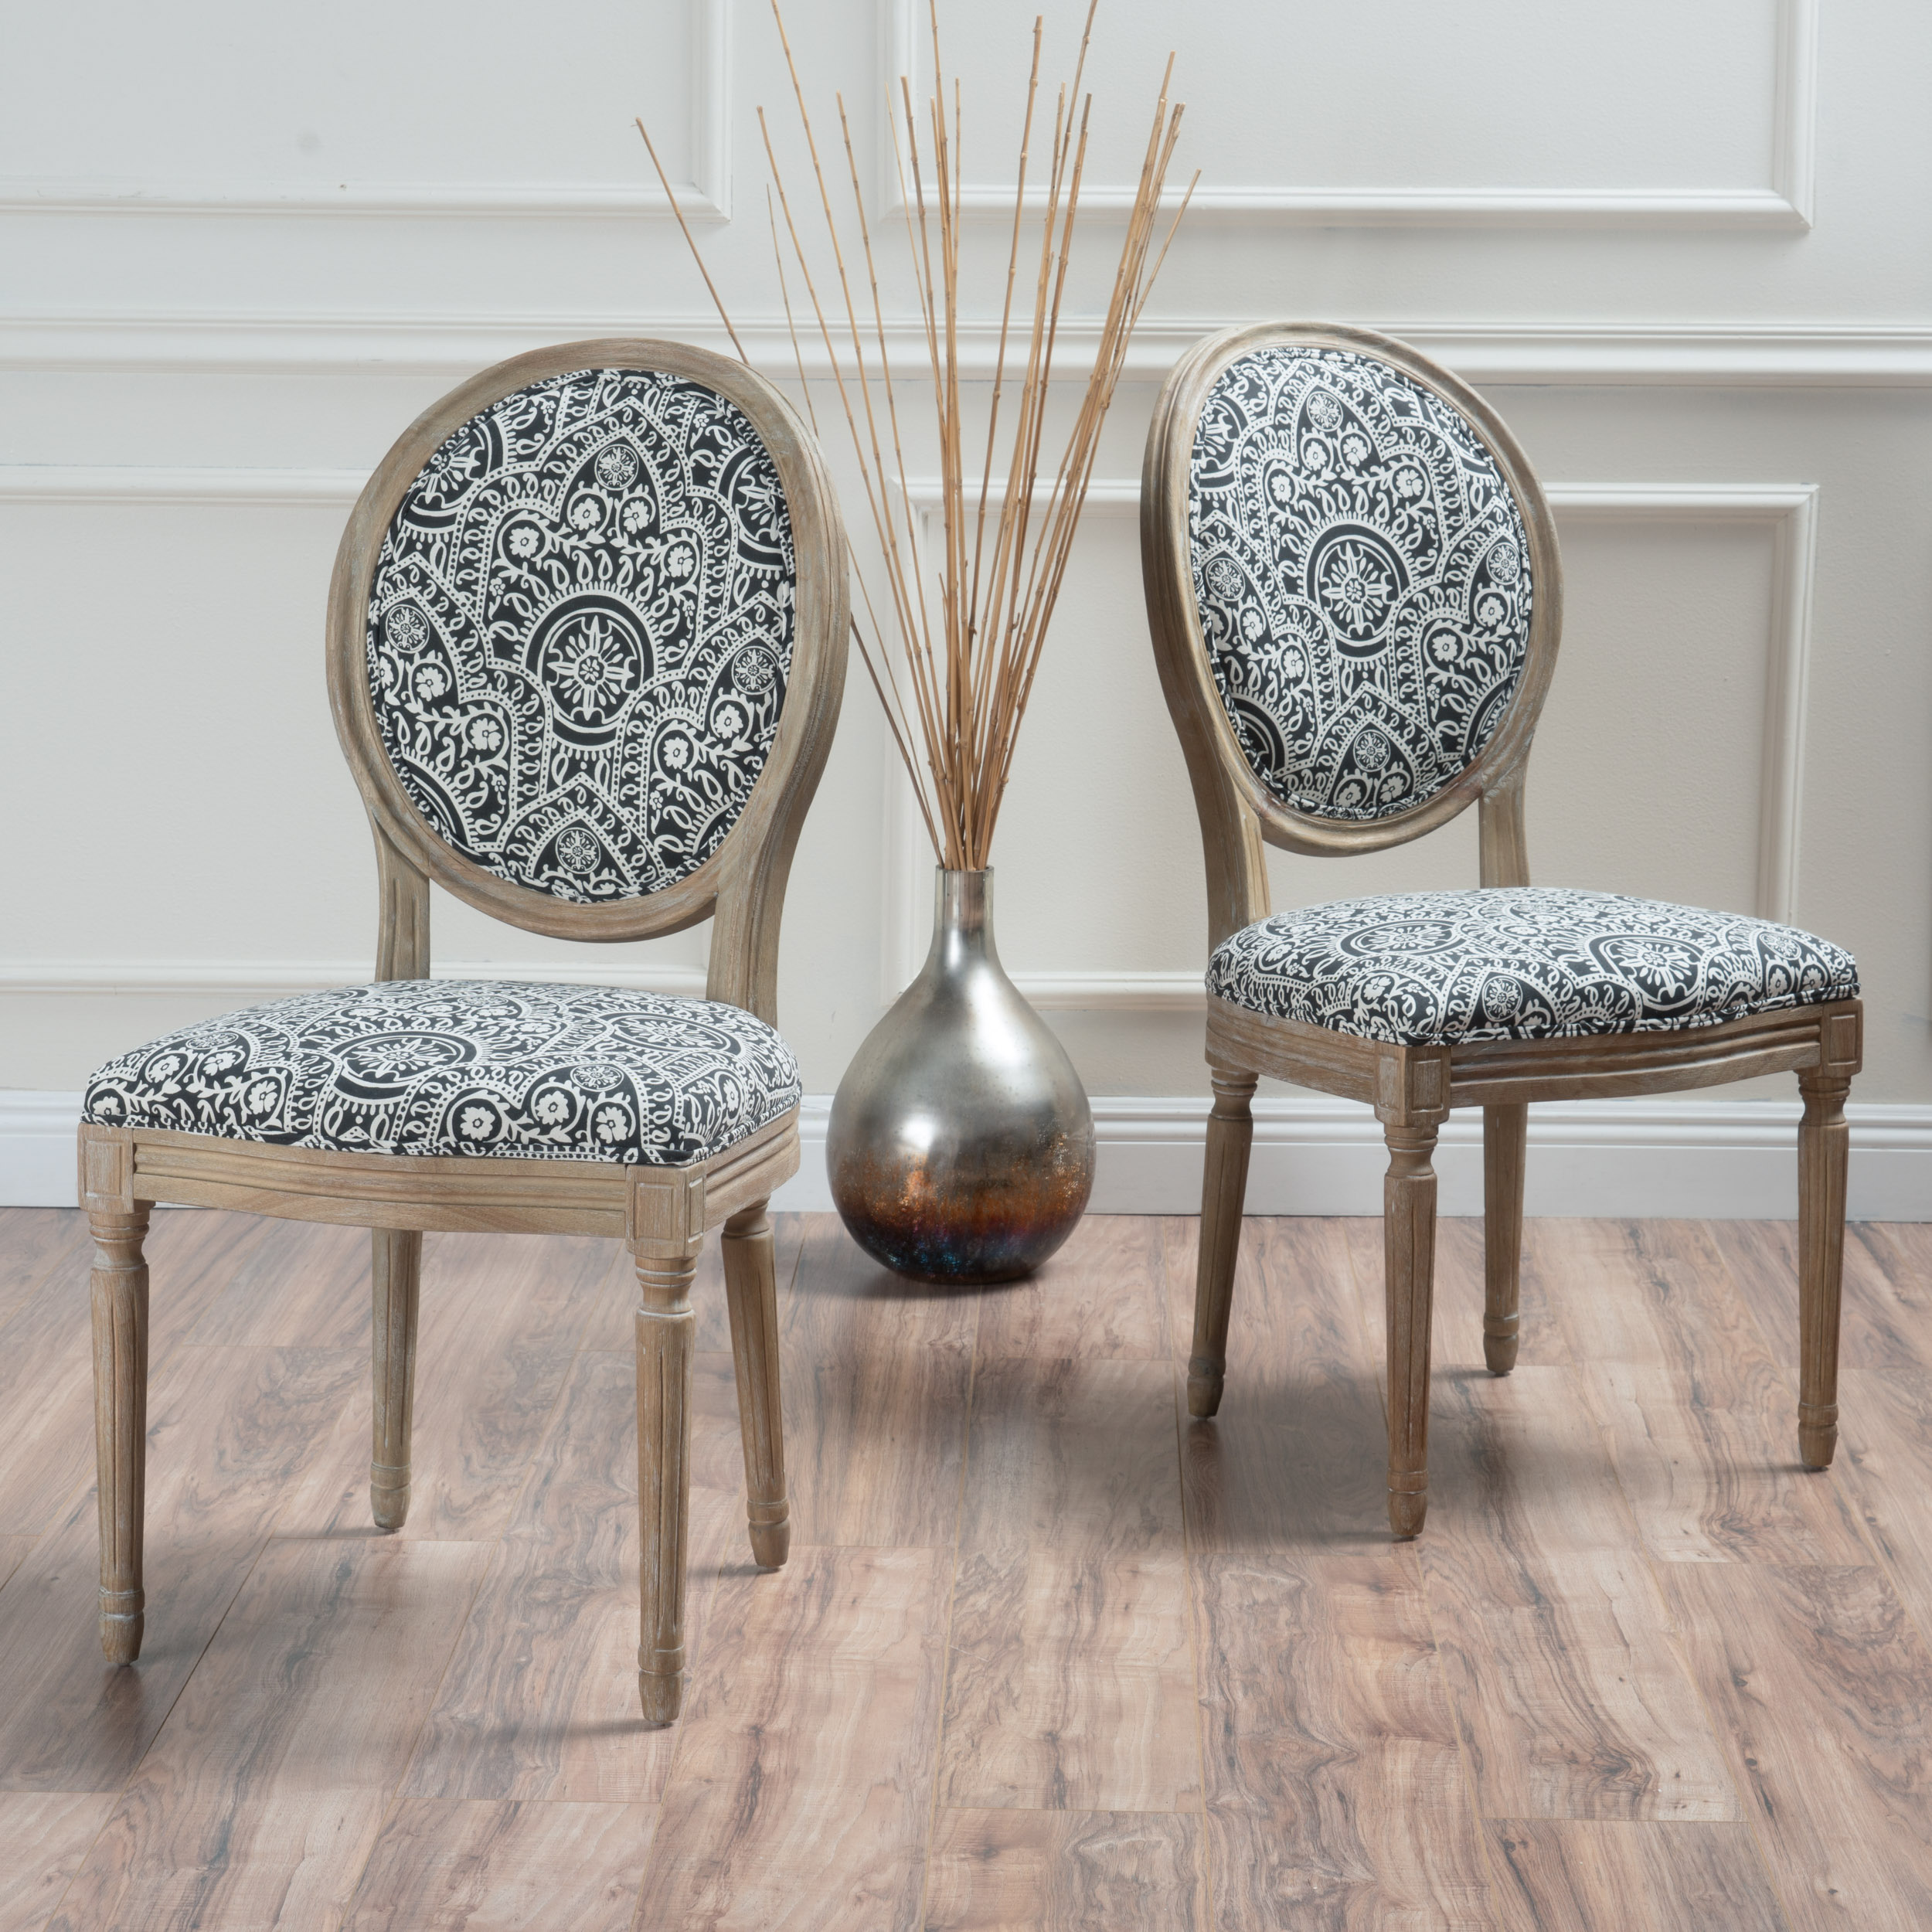 Noble House Nico Black And White Damask Fabric Dining Chair Set Of 2 Walmart Com Walmart Com